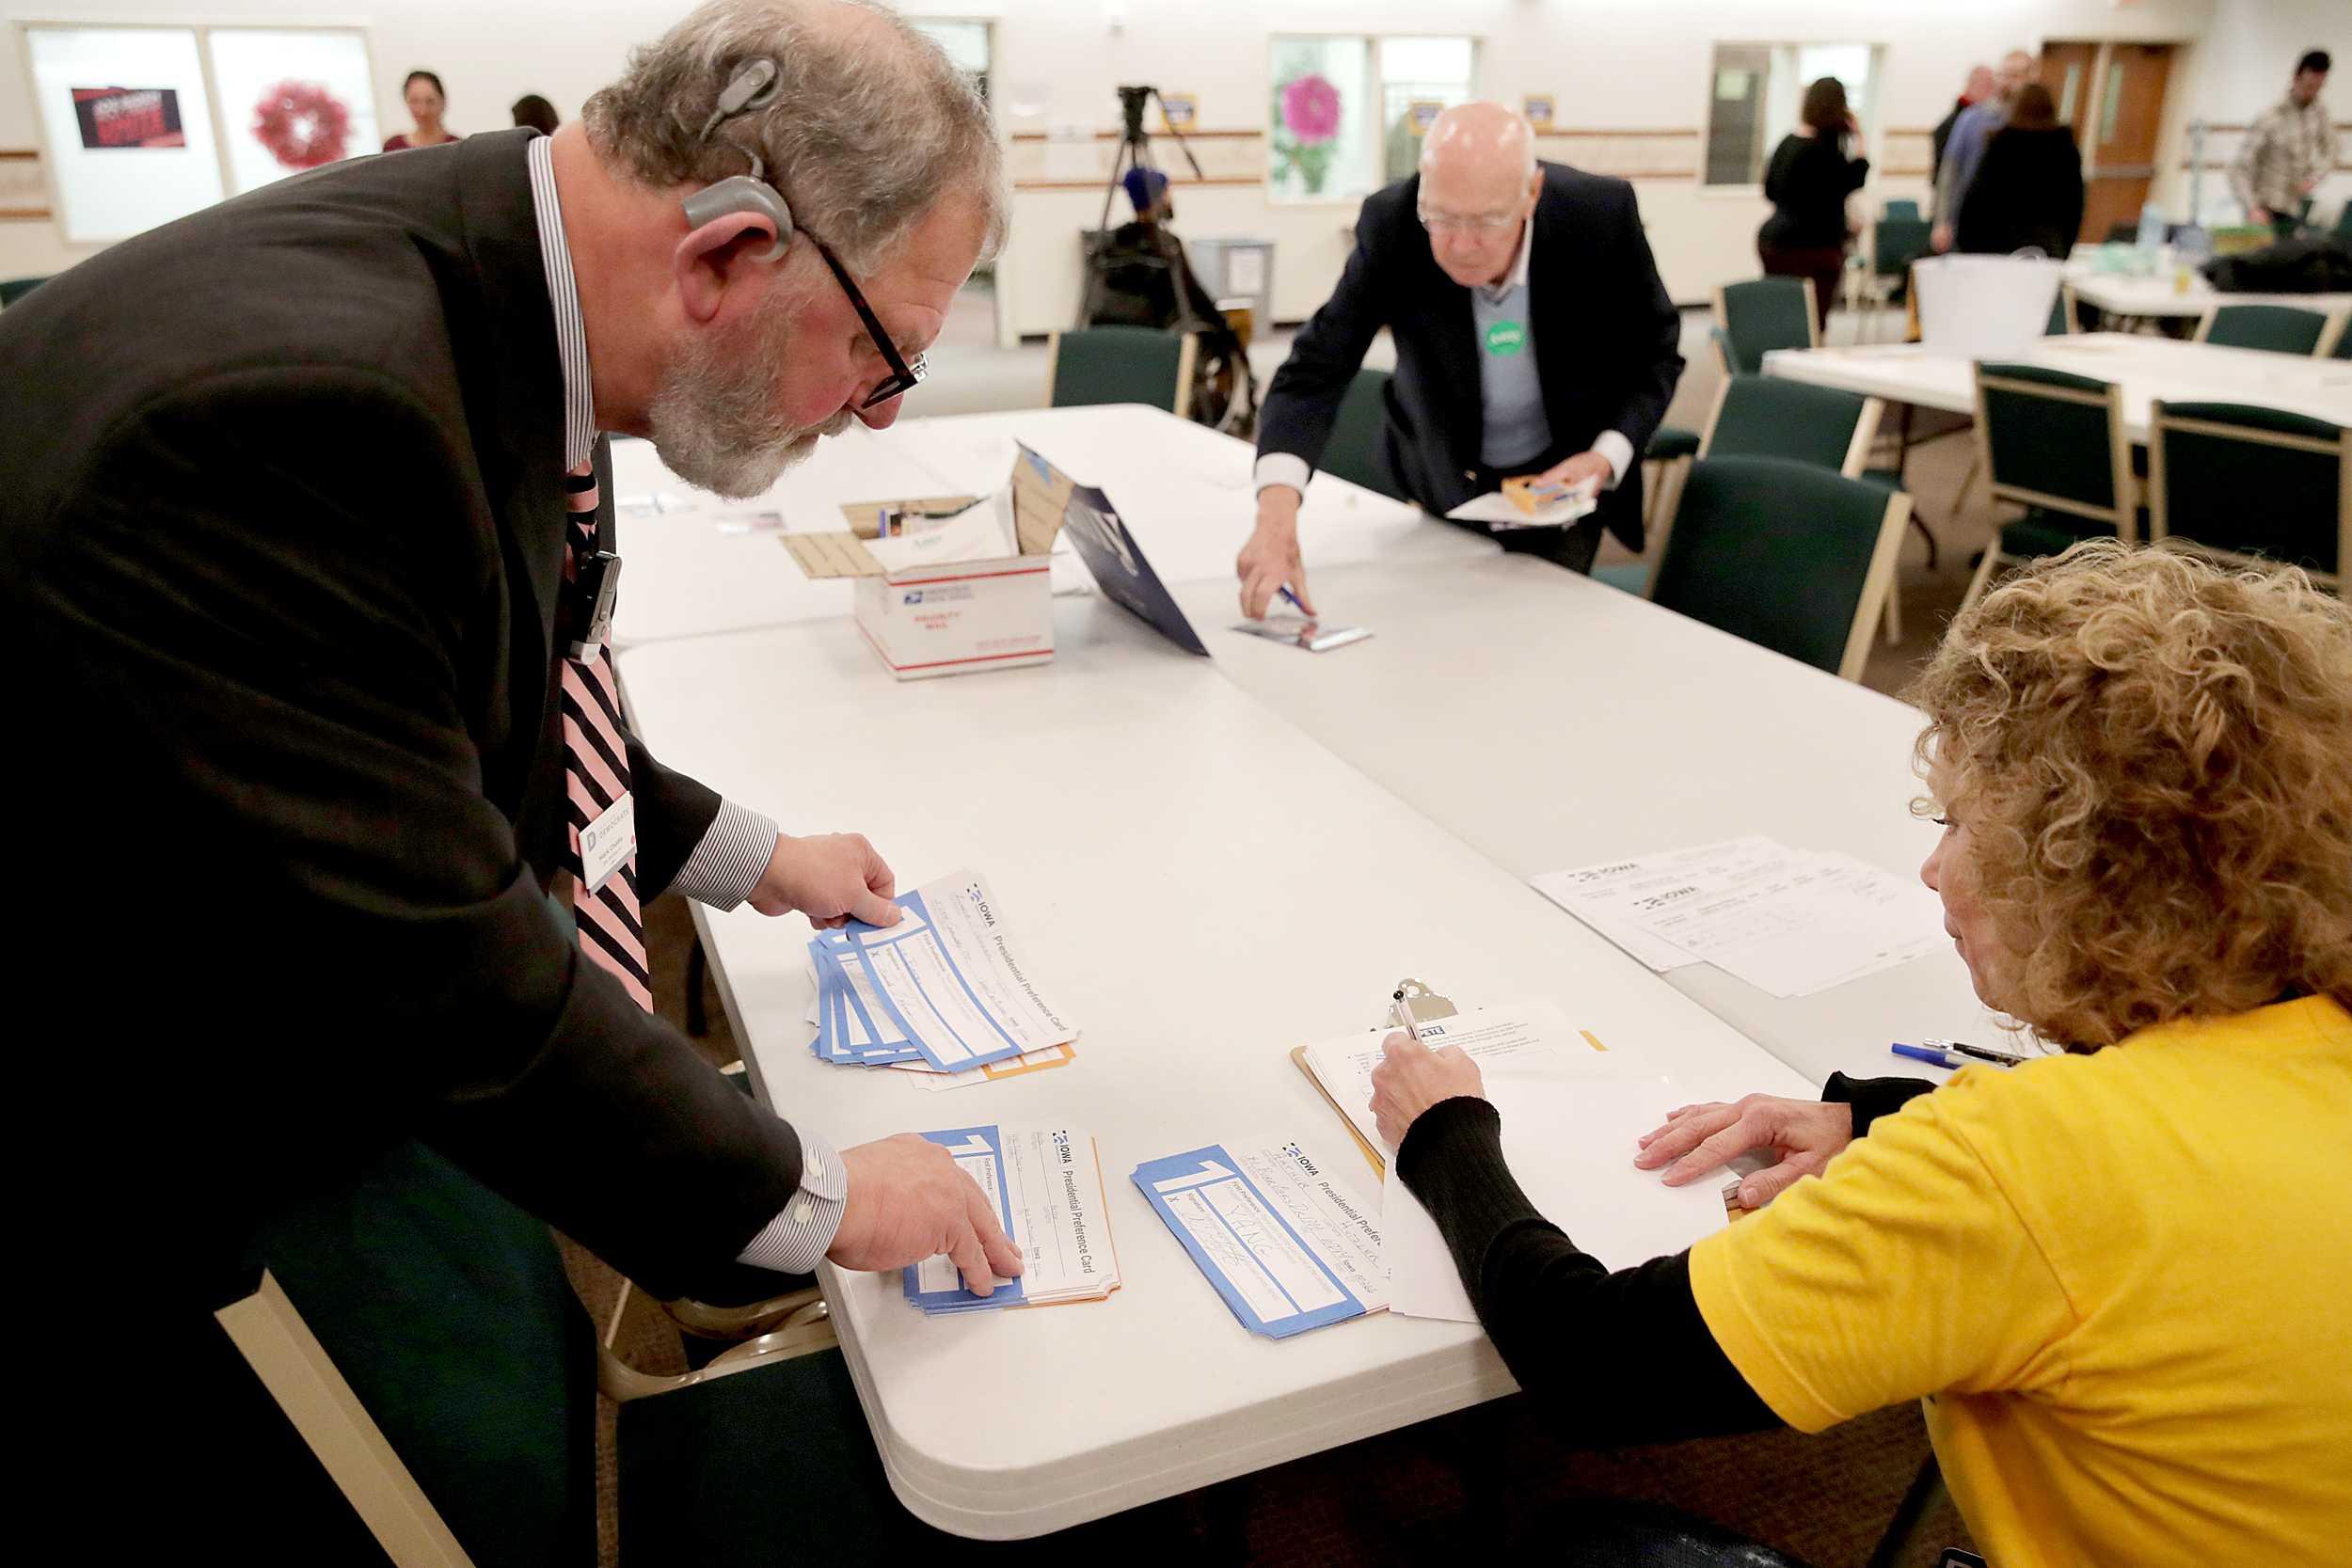 Experiencing the Caucus